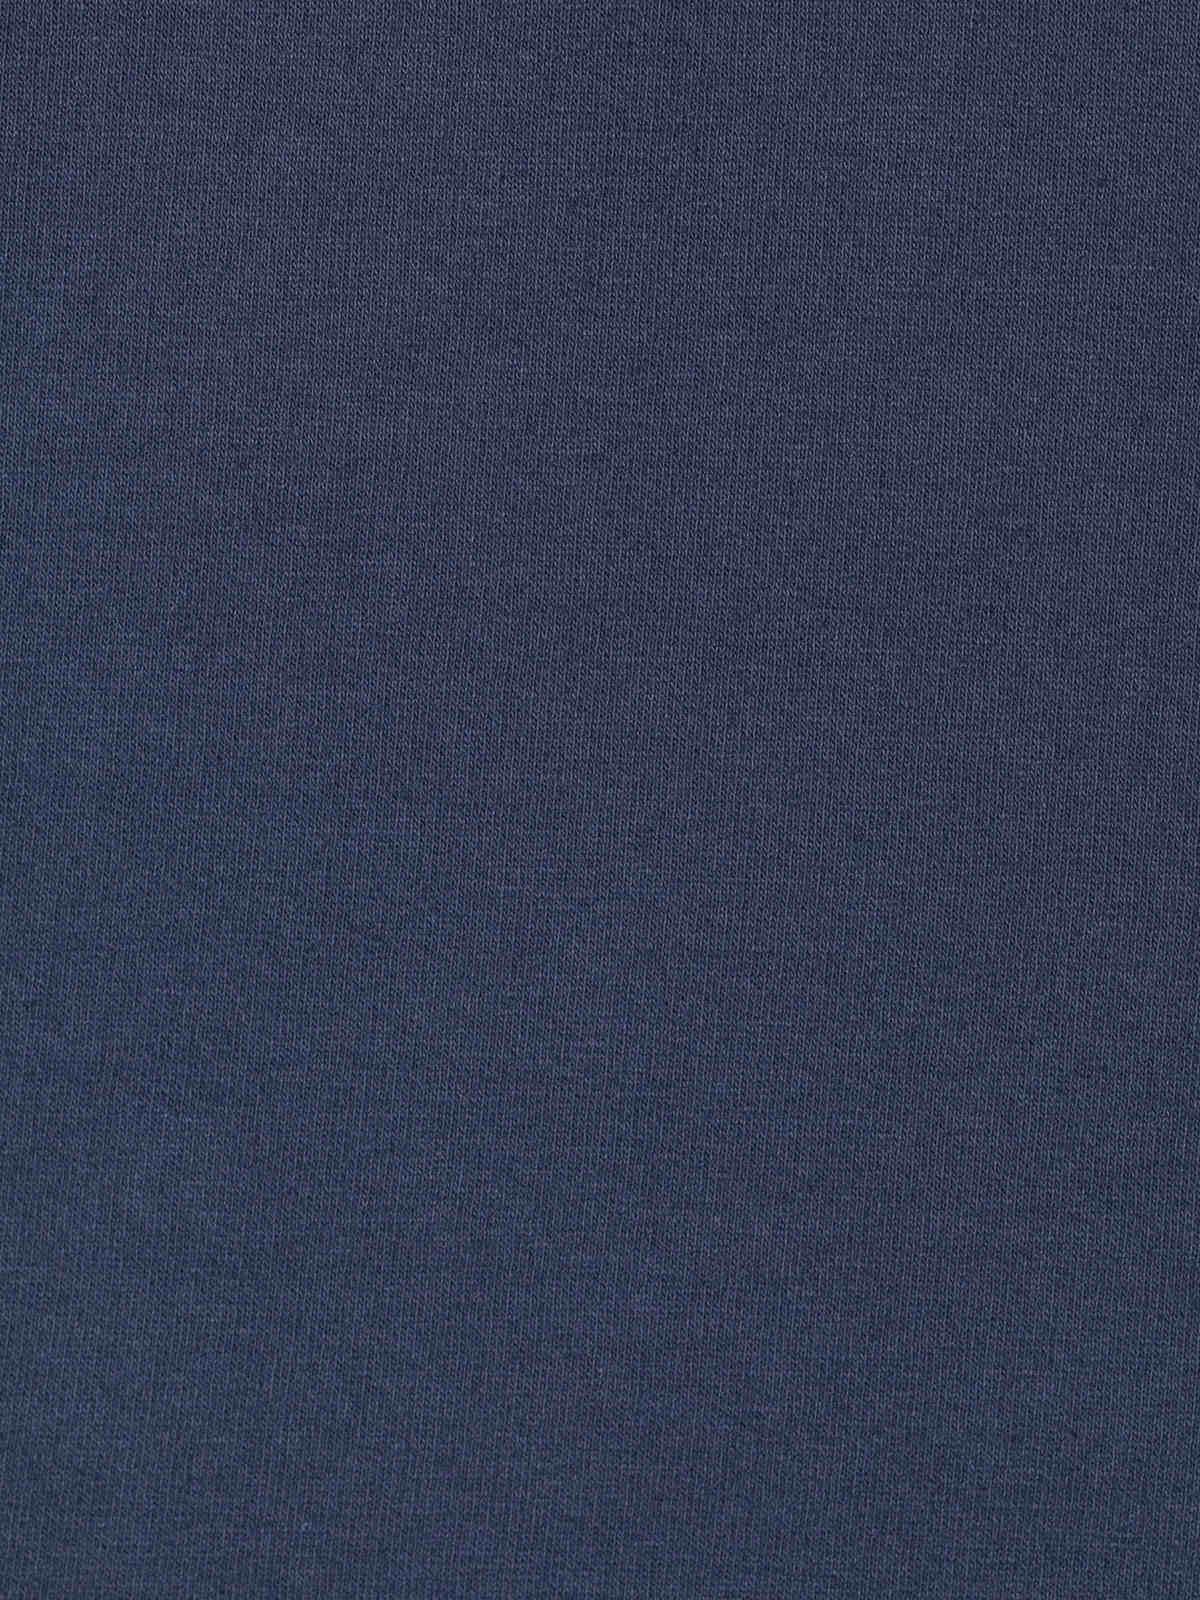 Woman Woman Retro rackets oversize sweatshirt Blue Navy